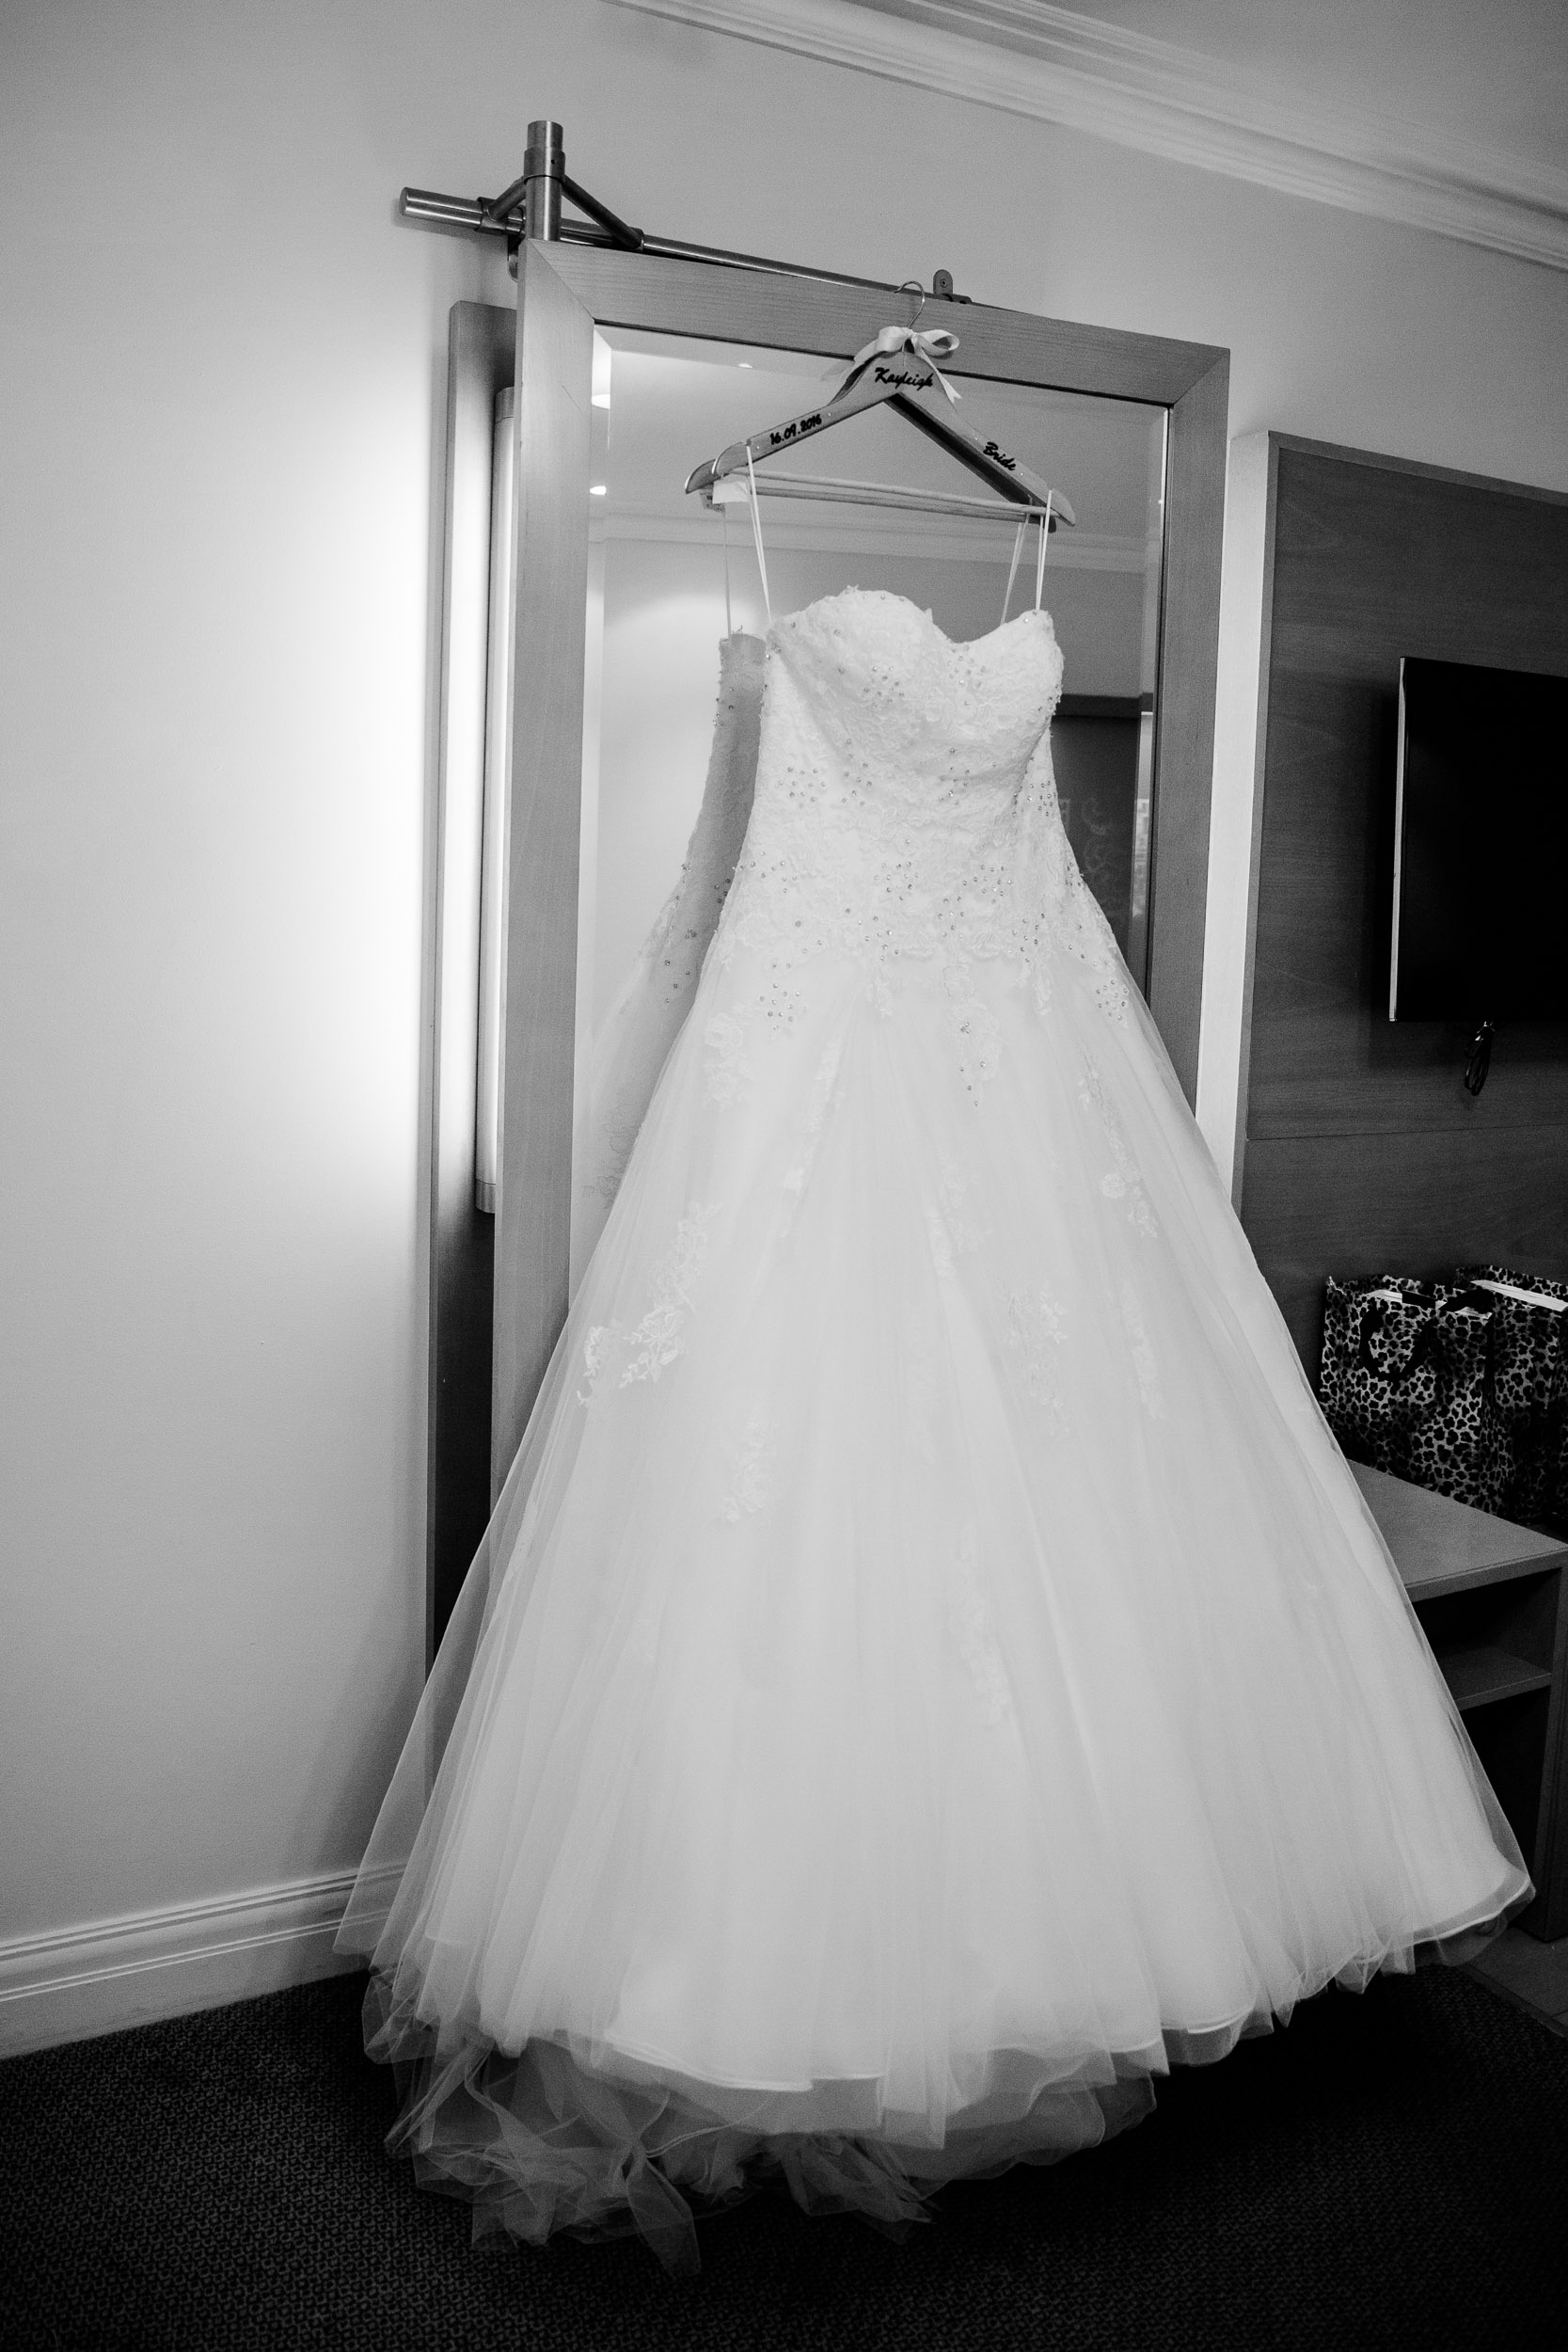 Brides Dress handing in hotel room Chesford Grange Hotel